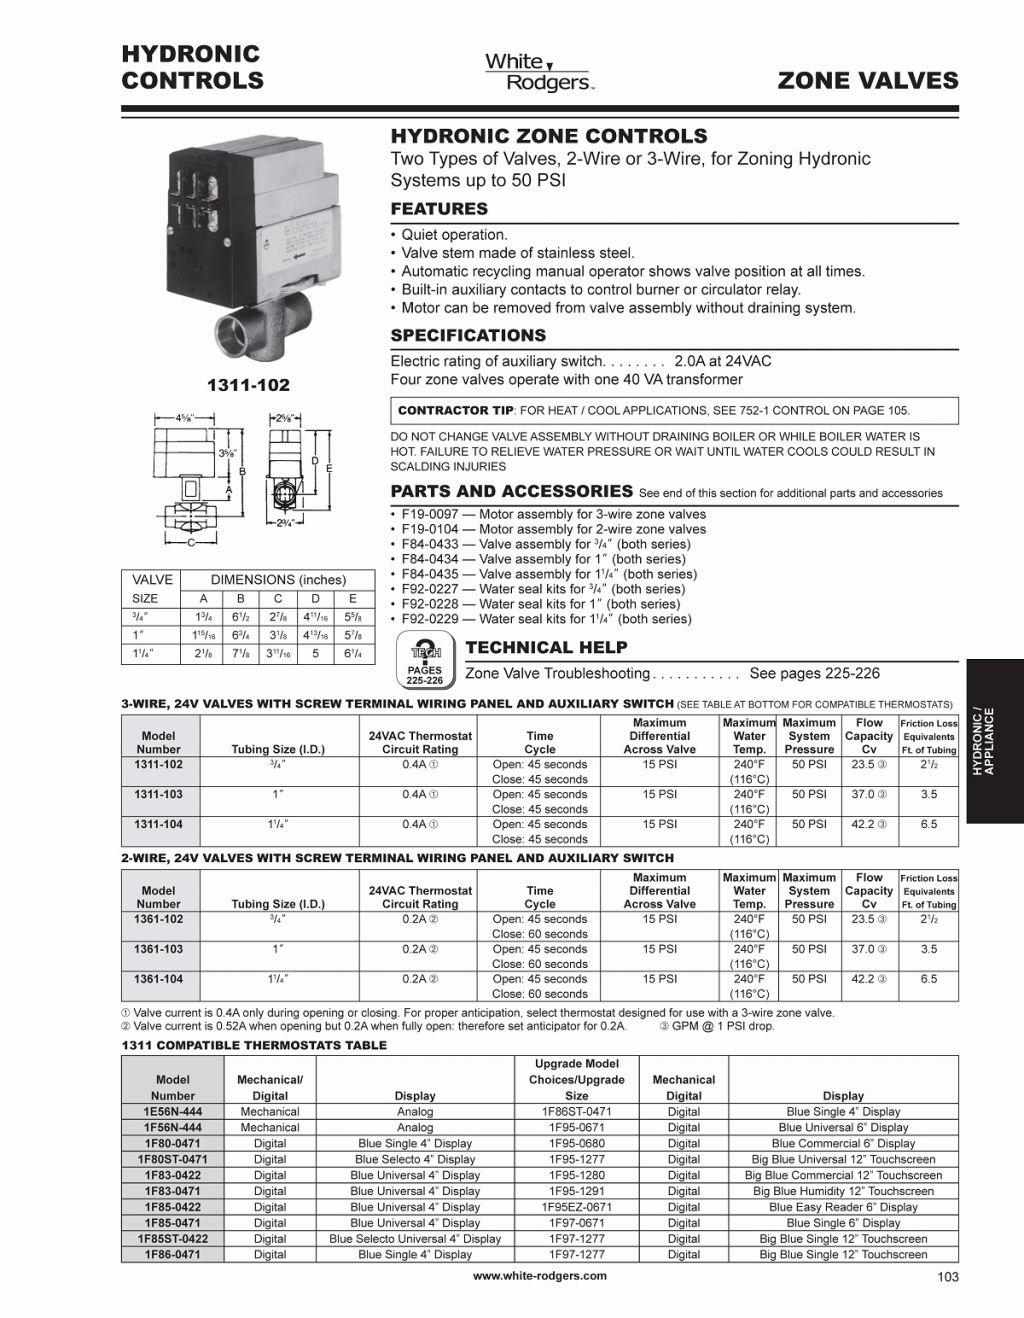 KA_8494] Likewise White Rodgers Thermostat Wiring On Zone Valve Wiring  Diagram Schematic Wiring   White Rodgers 1361 102 Wiring Diagram      Ungo Momece Mohammedshrine Librar Wiring 101